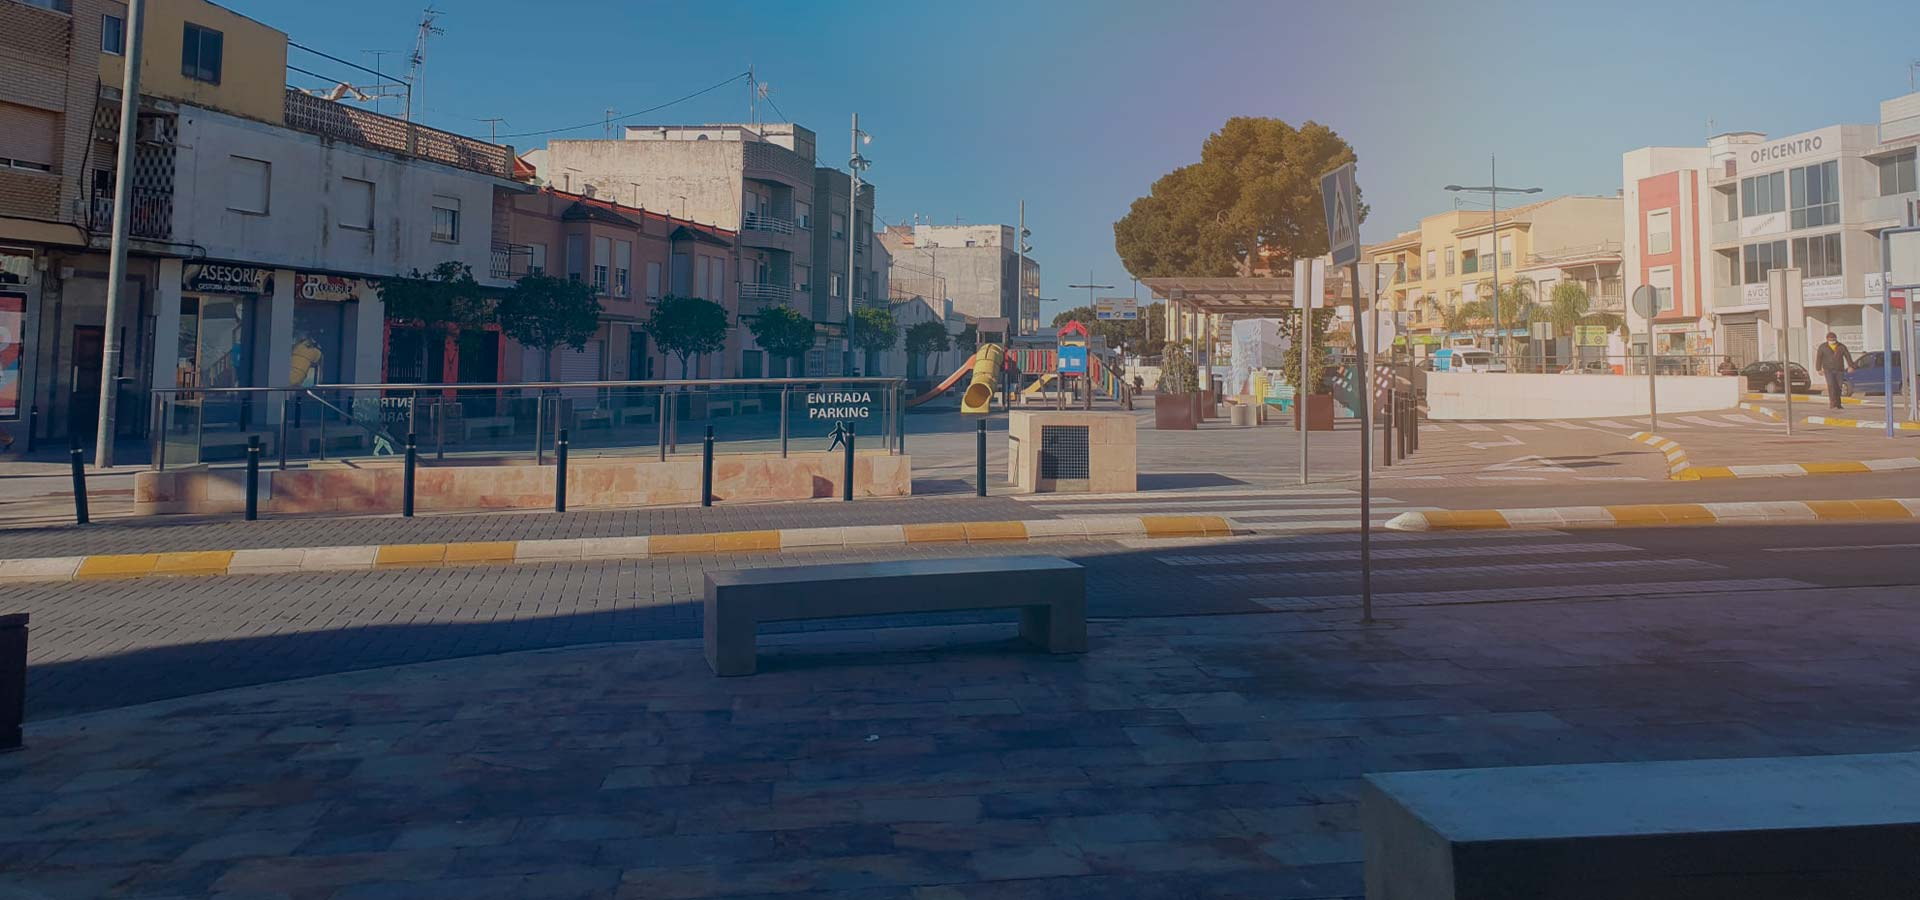 Aparcamiento-Plaza-Espana-San-Javier-New-Capital